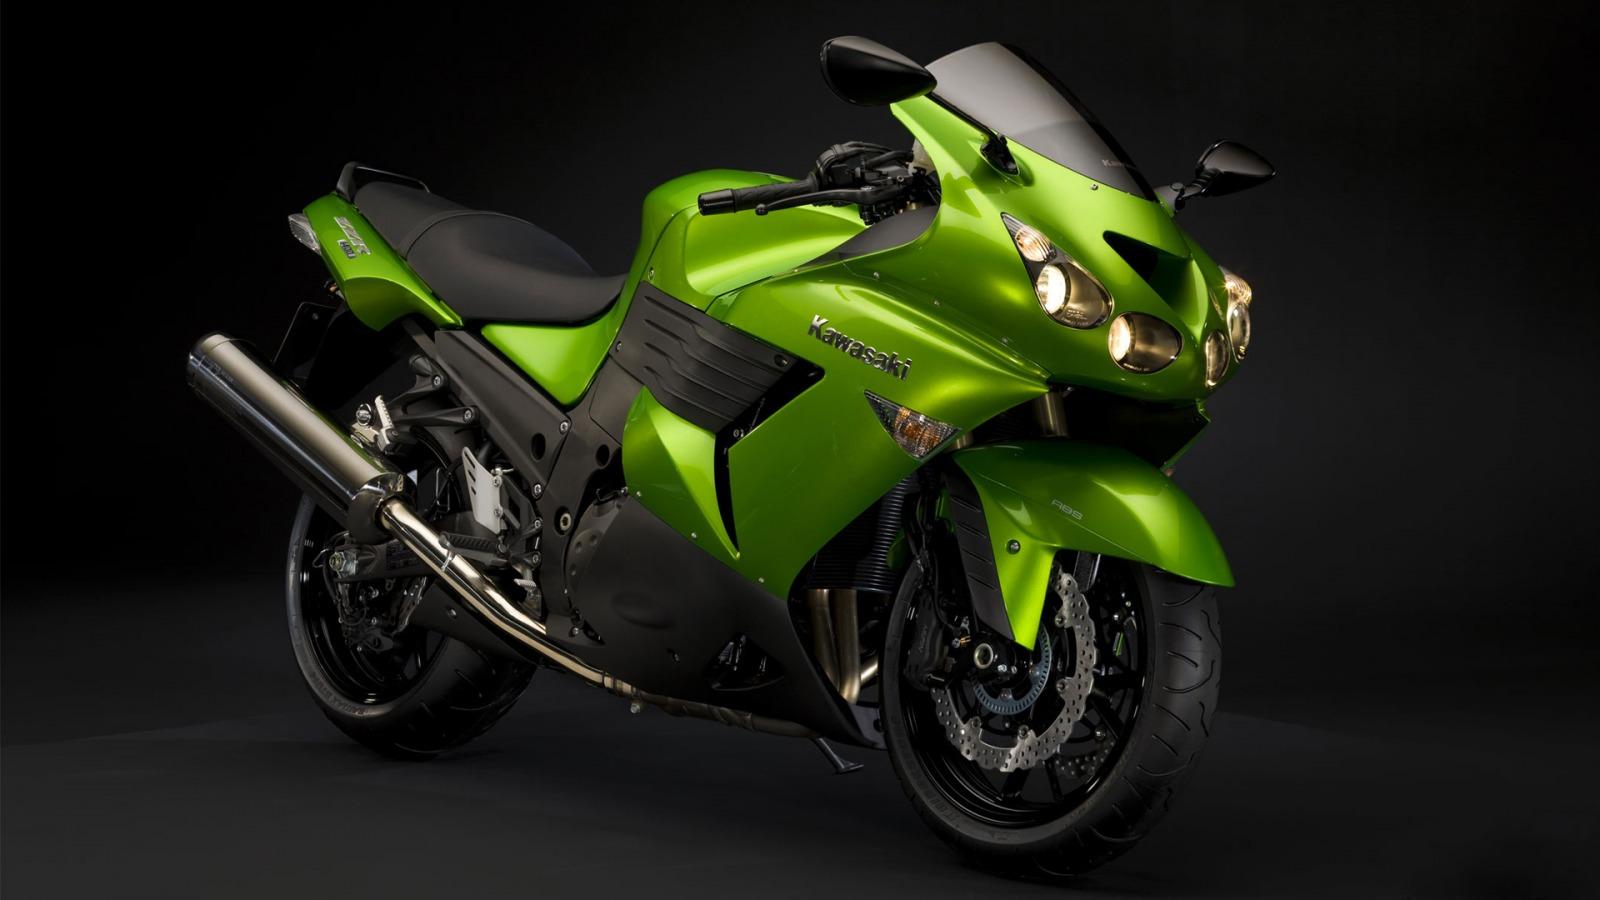 Insane Kawasaki Bike Hd Wallpaper: Kawasaki ZZR 1400 Wallpaper Kawasaki Motorcycles